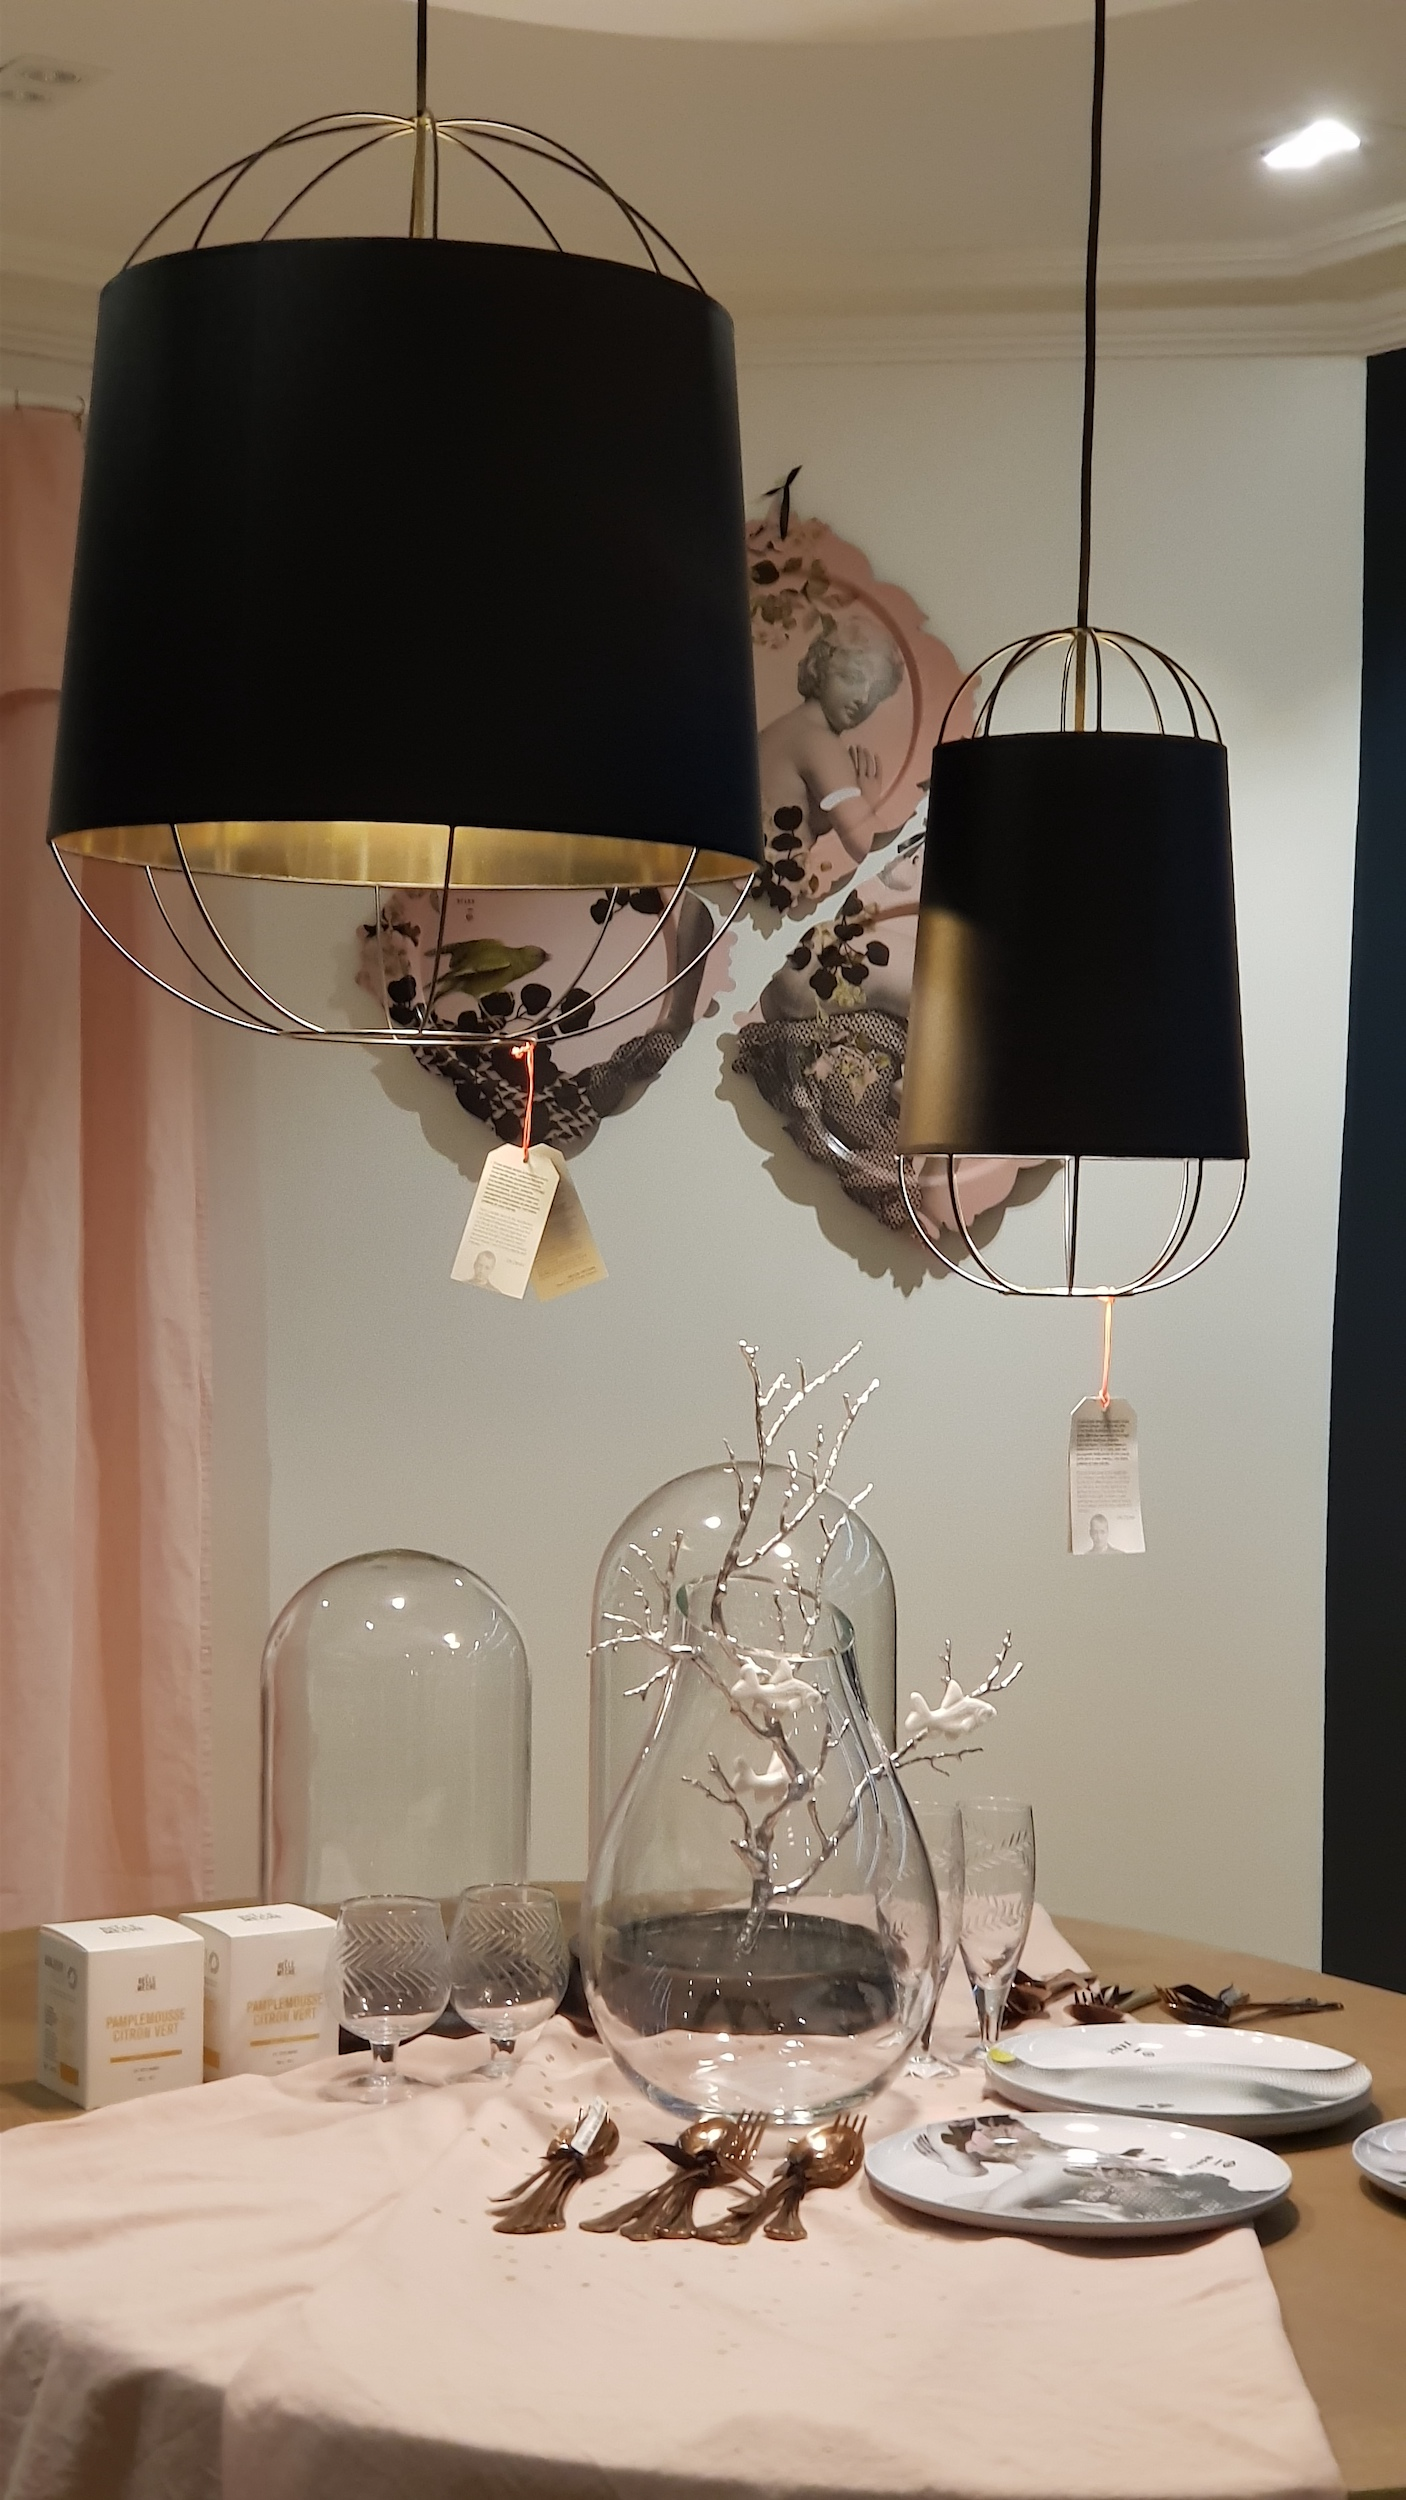 Renovation-boutique-decoration-lagny-77-carre-1-original